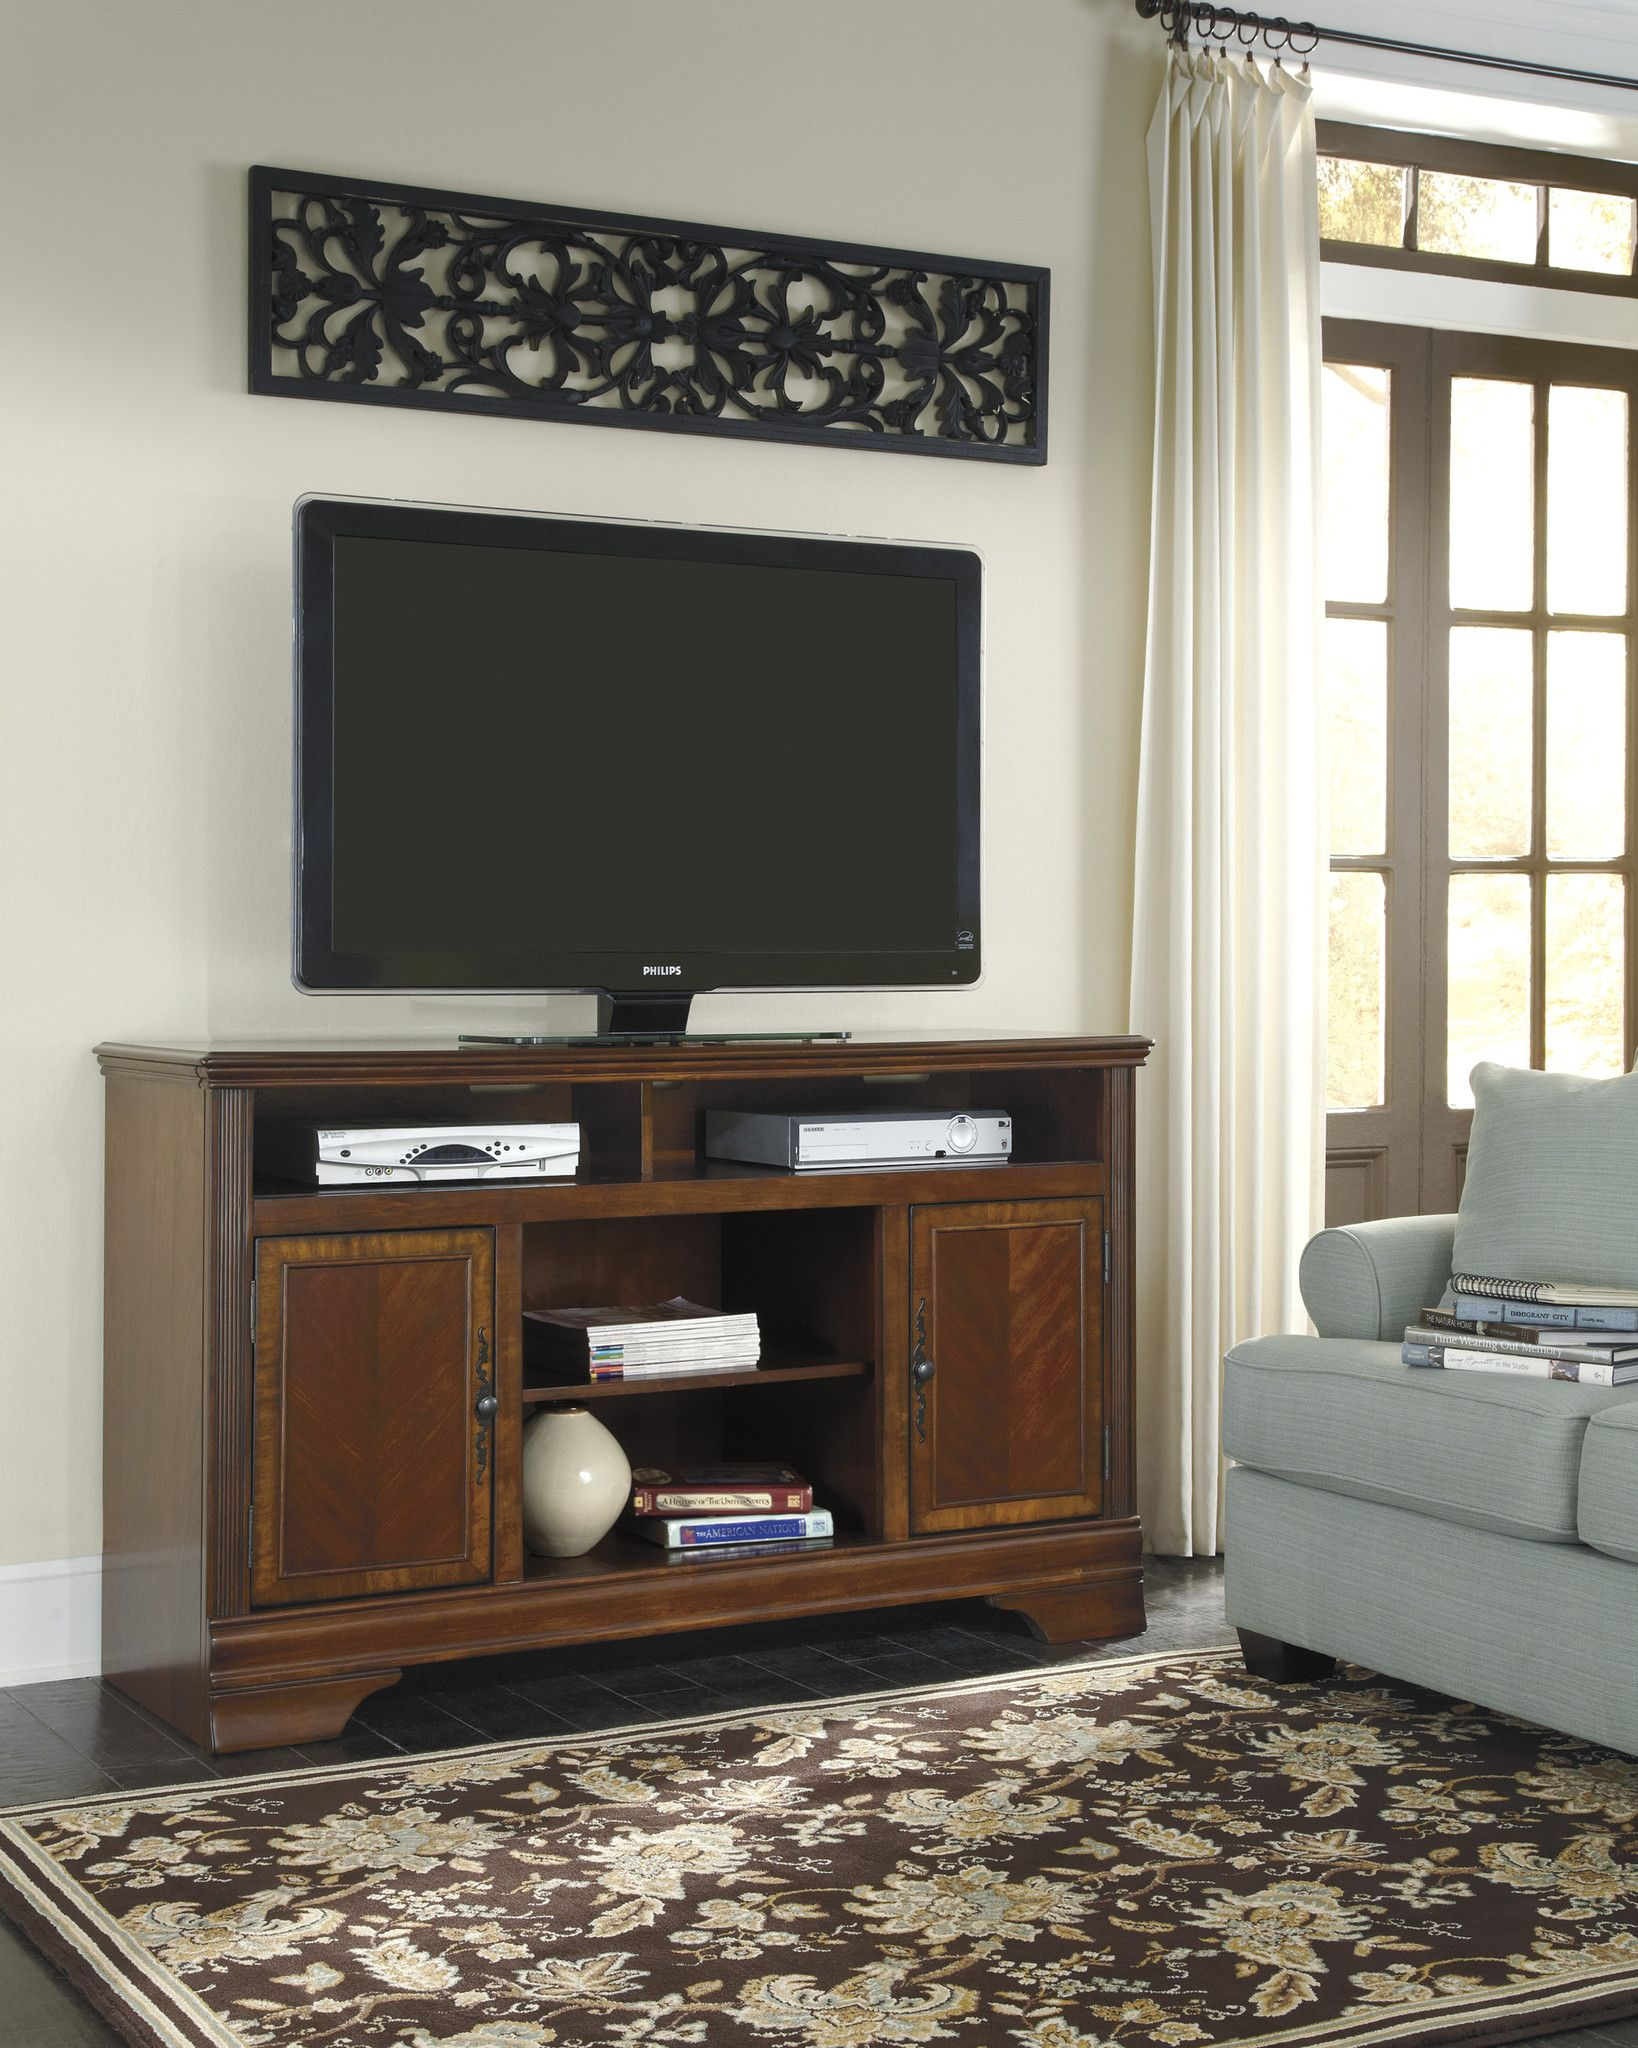 Hamlyn lg tv stand wfireplace option products pinterest tvs